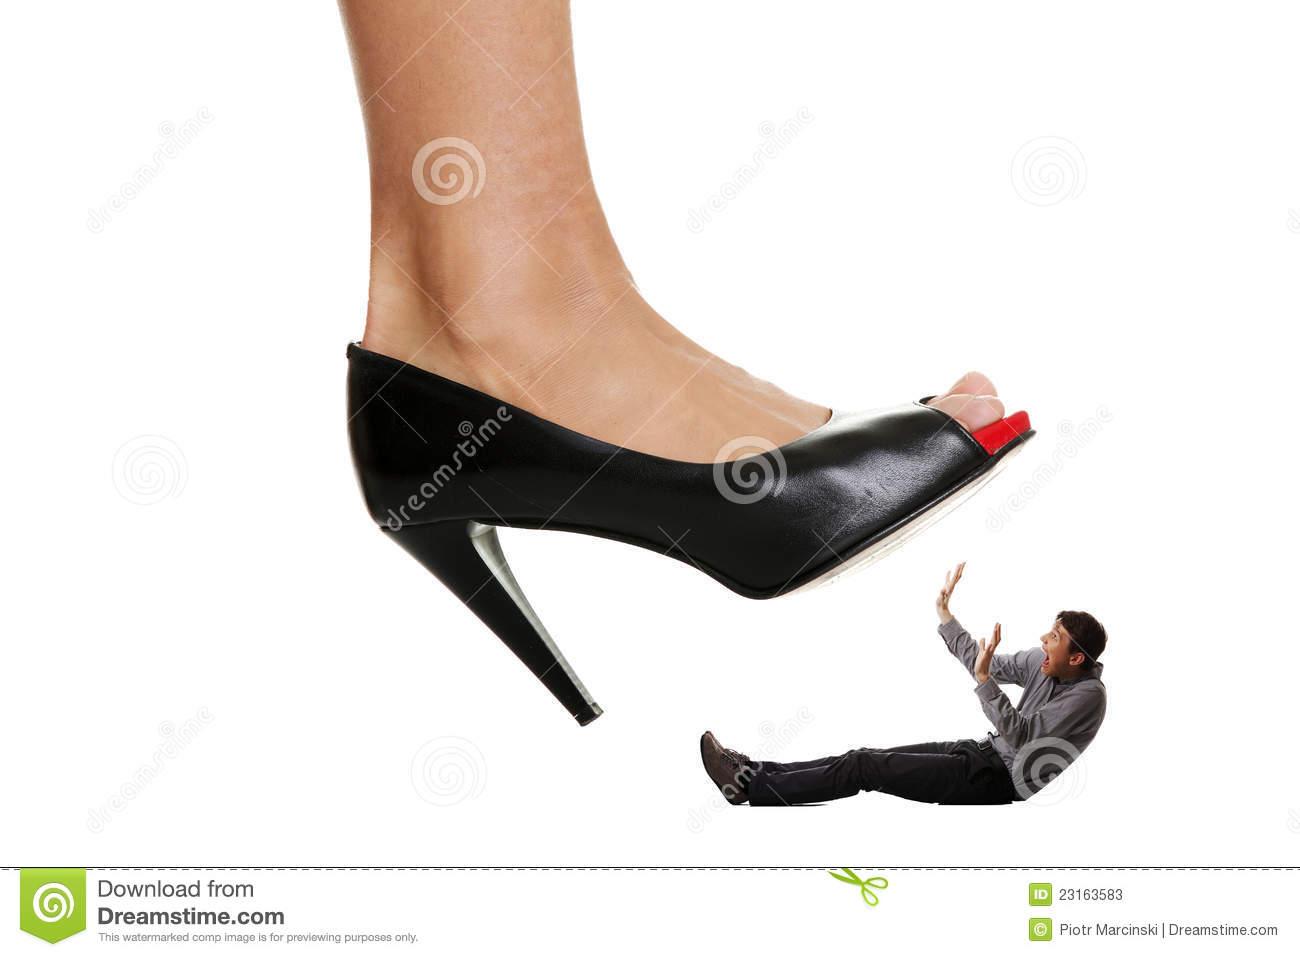 woman-shoe-stepping-business-men-23163583.jpg